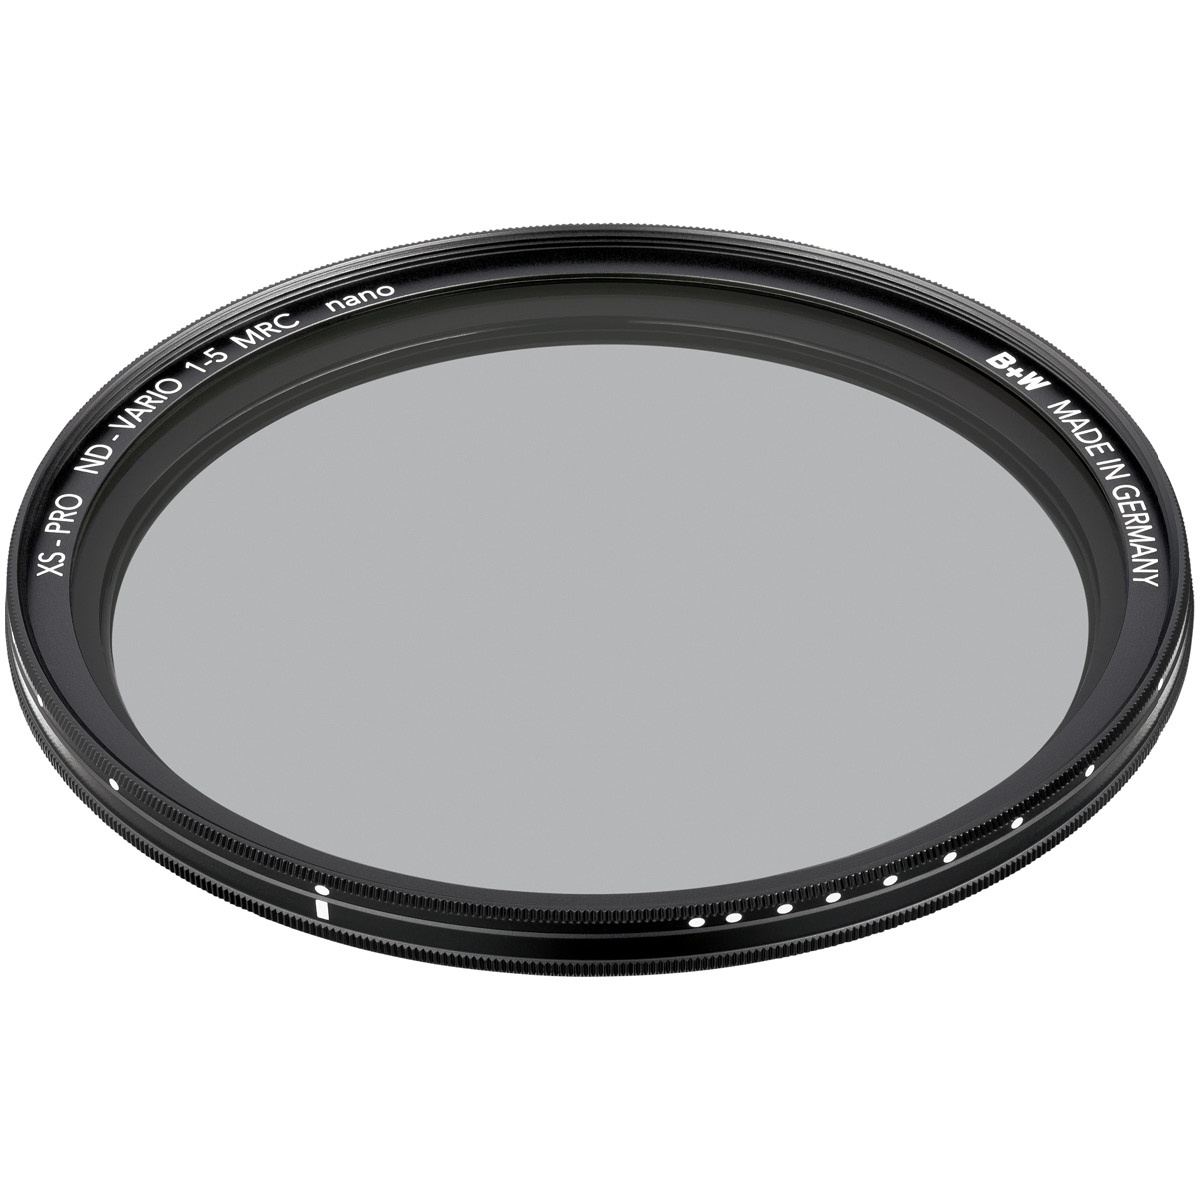 B+W Graufilter 77mm XS-Pro Vario +1 - +5